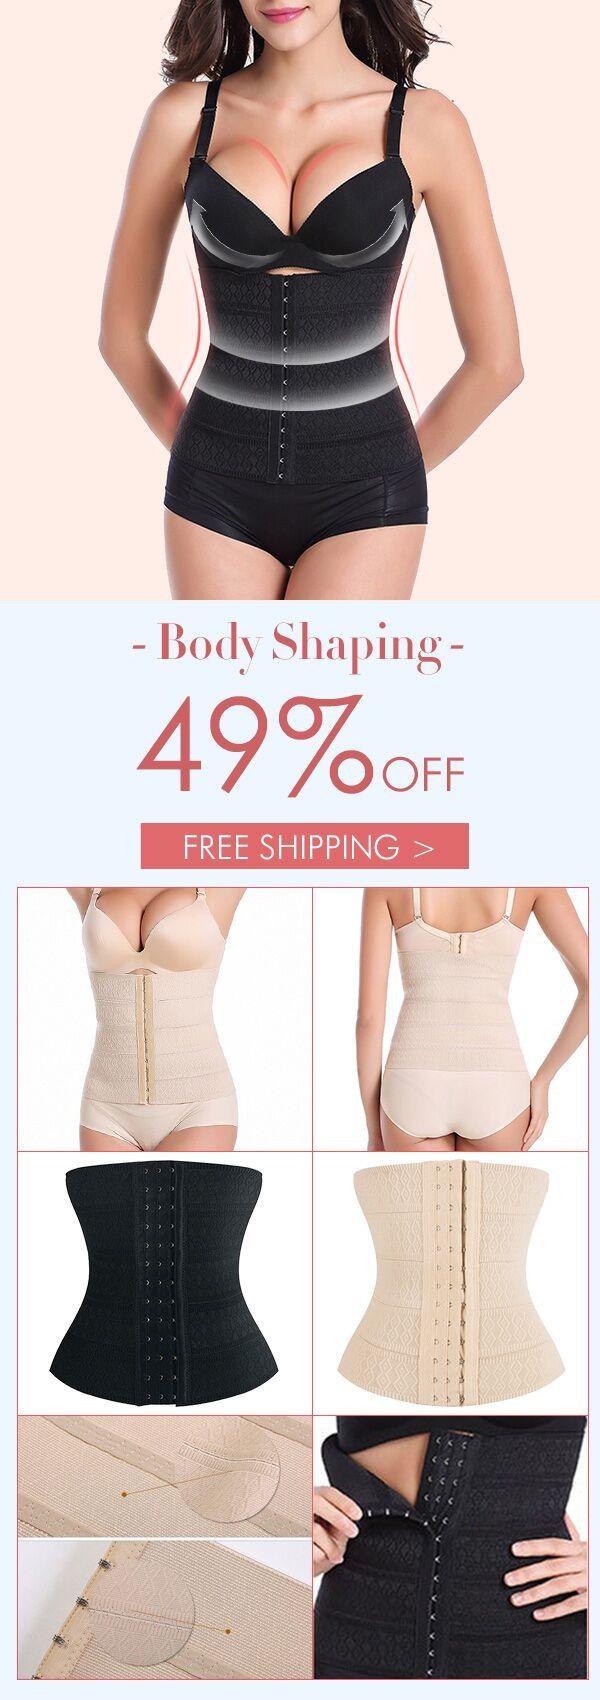 Breathable Elastic Corset Waist Trainer Hot Shaper Body Slimming Belt Modeling Strap Shapewear